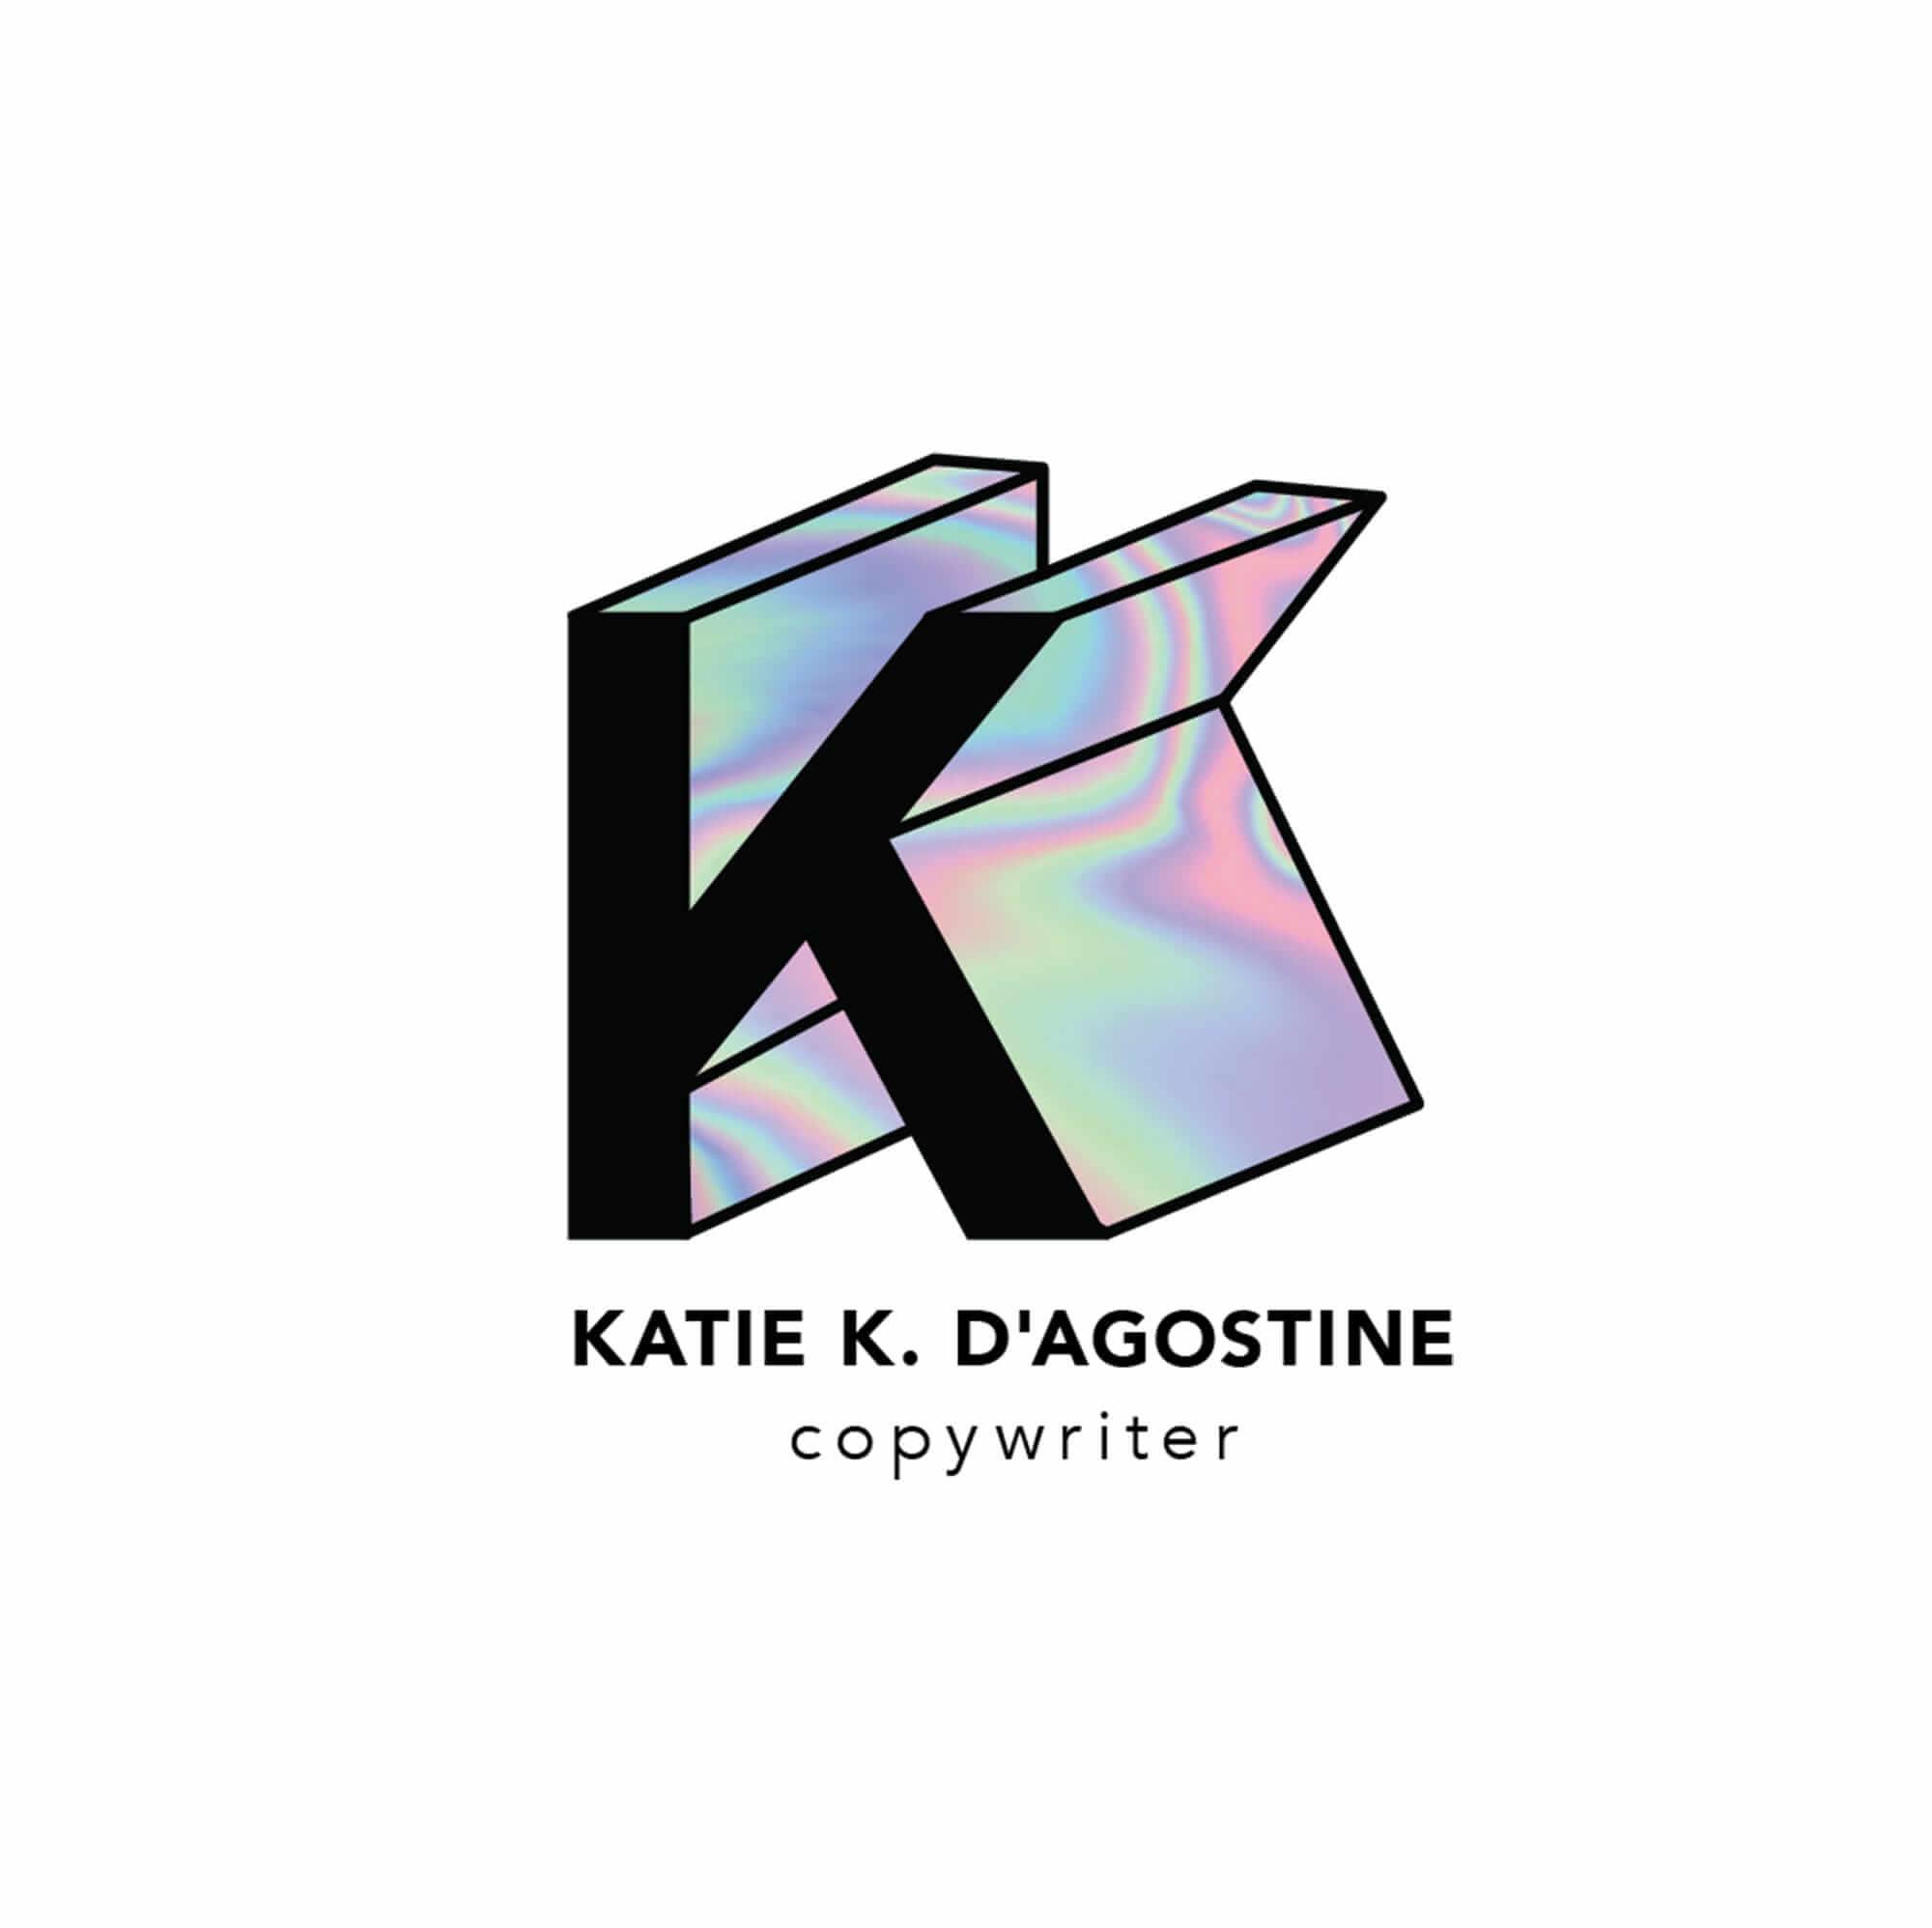 logos_0014_katie